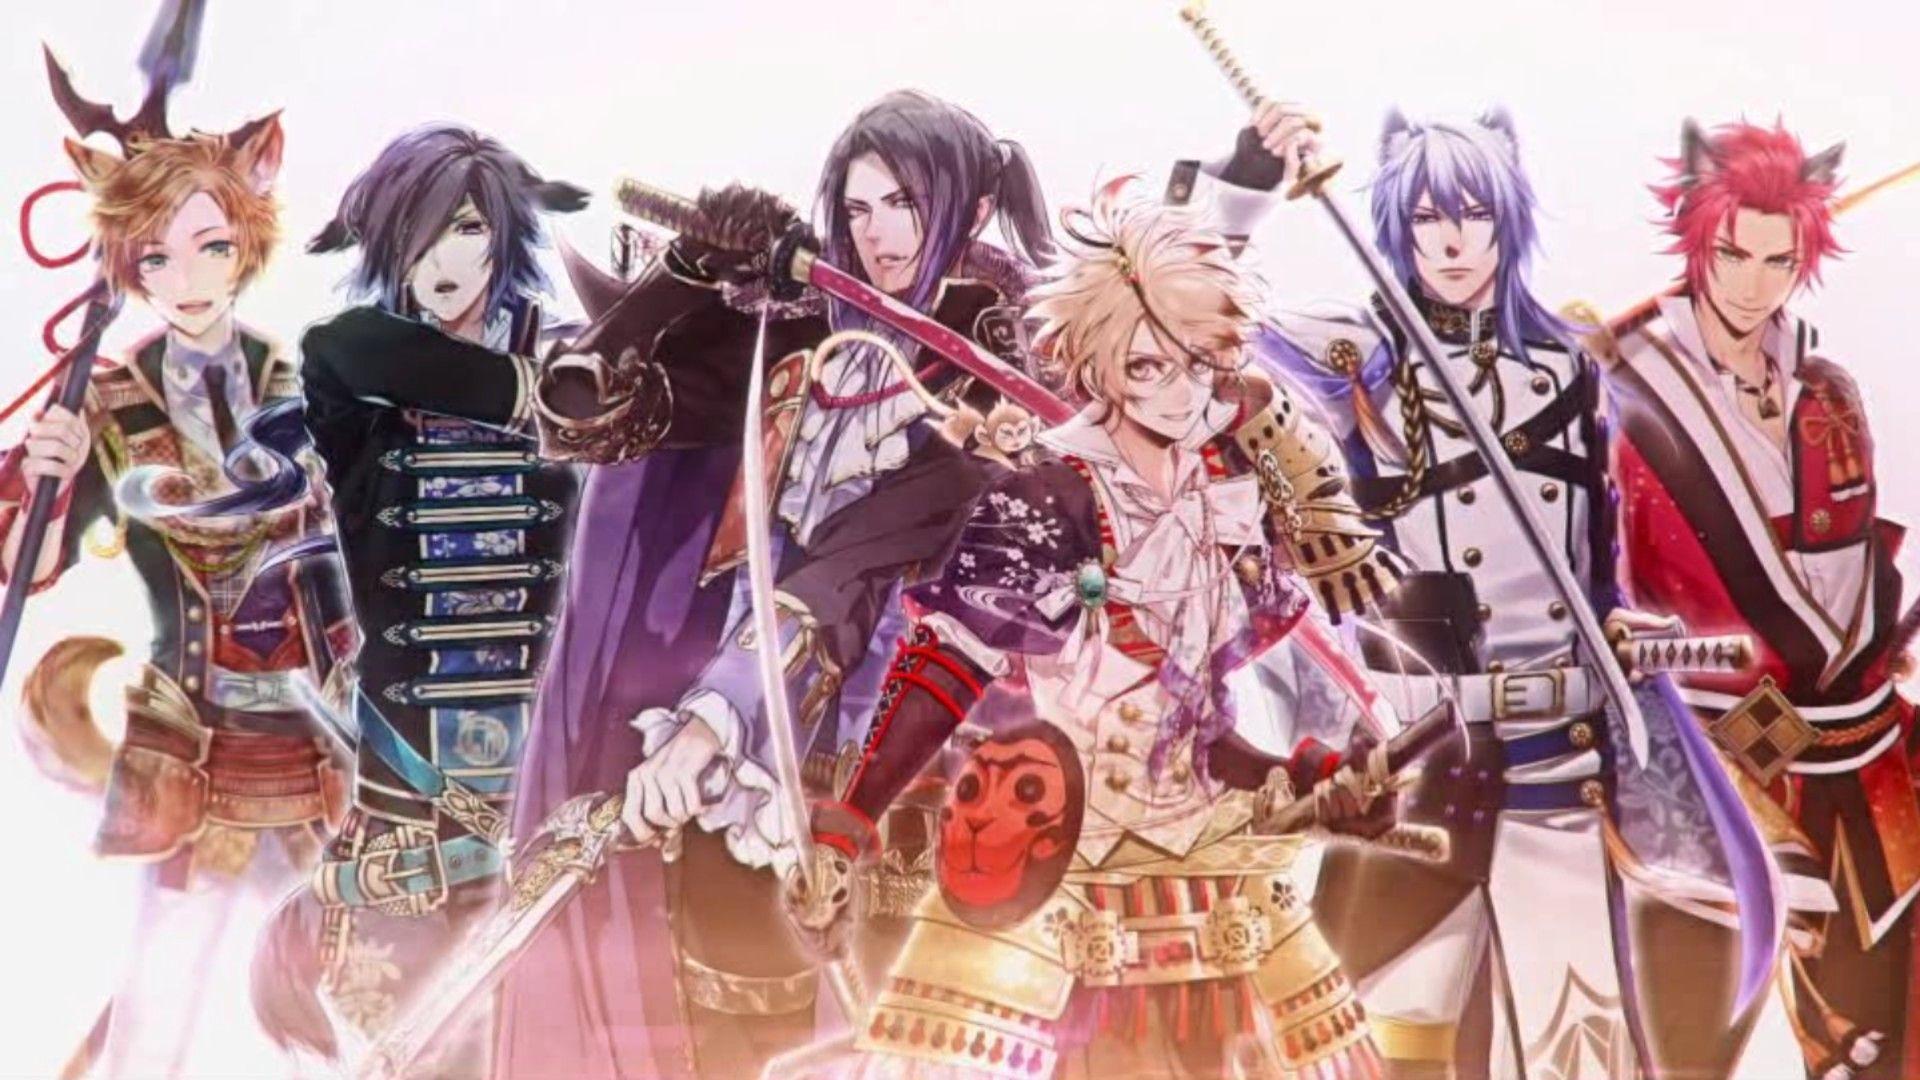 Awesome anime like Dance With Devils, Sengoku Night Blood